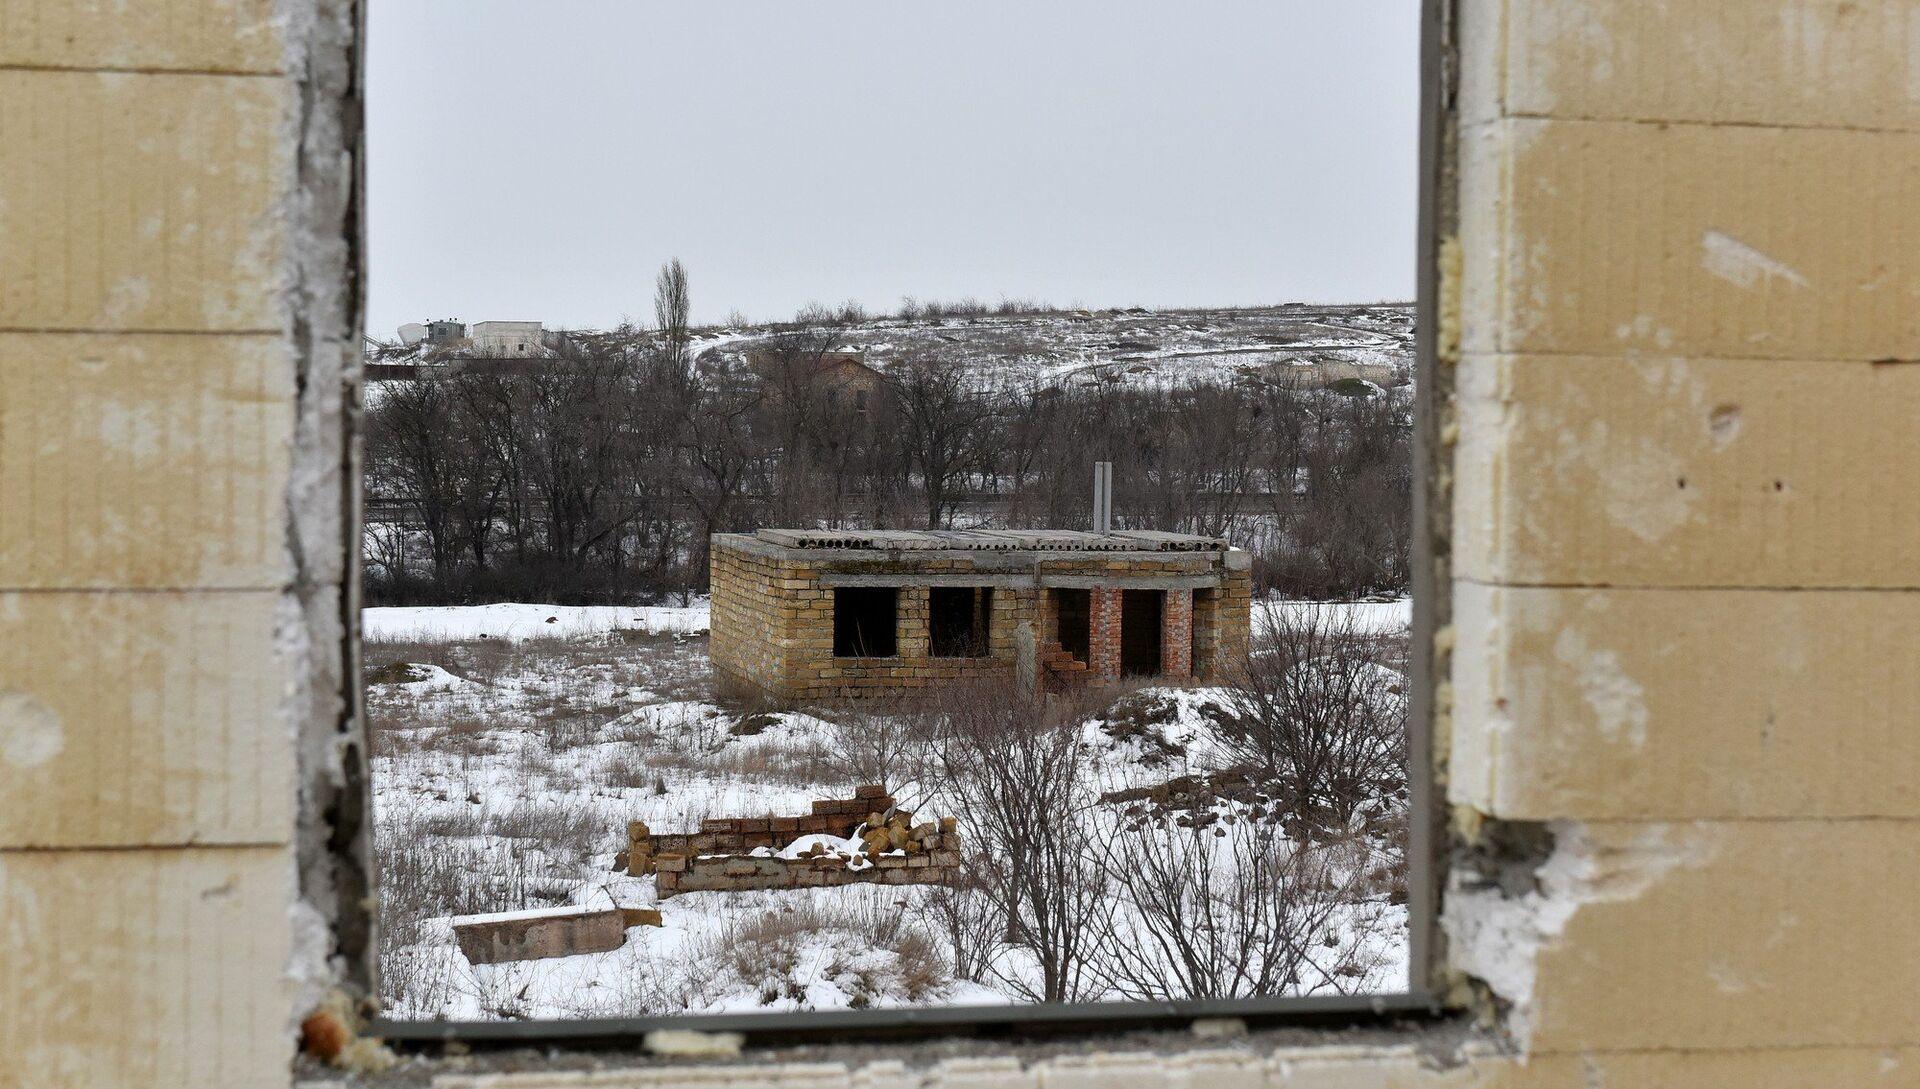 Самозахват Стрелковое в Симферополе  - РИА Новости, 1920, 23.01.2020